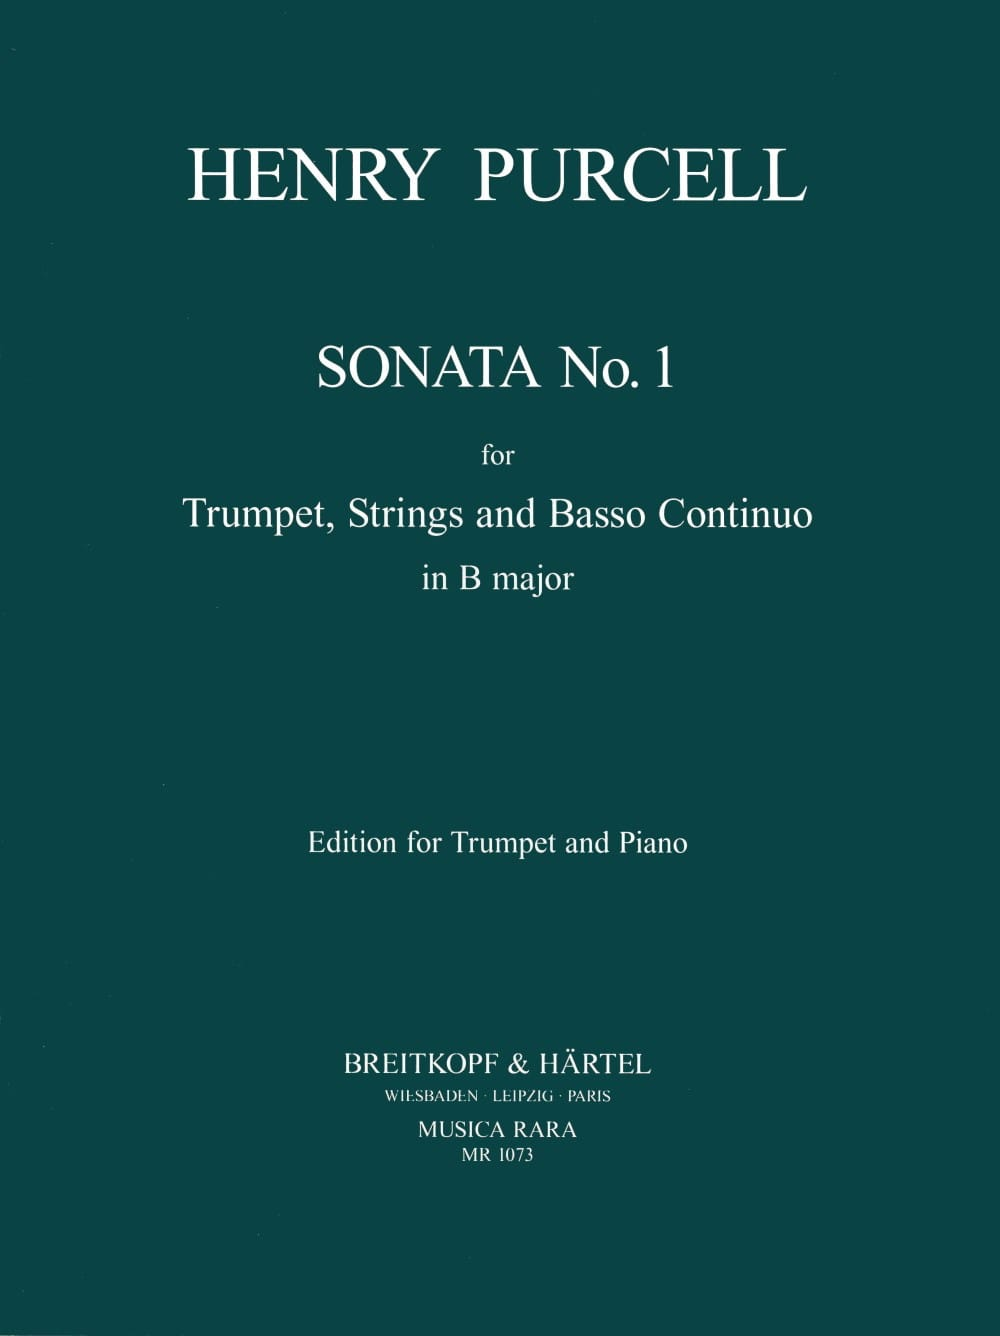 Sonata. Trompette - Henry Purcell - Partition - laflutedepan.com